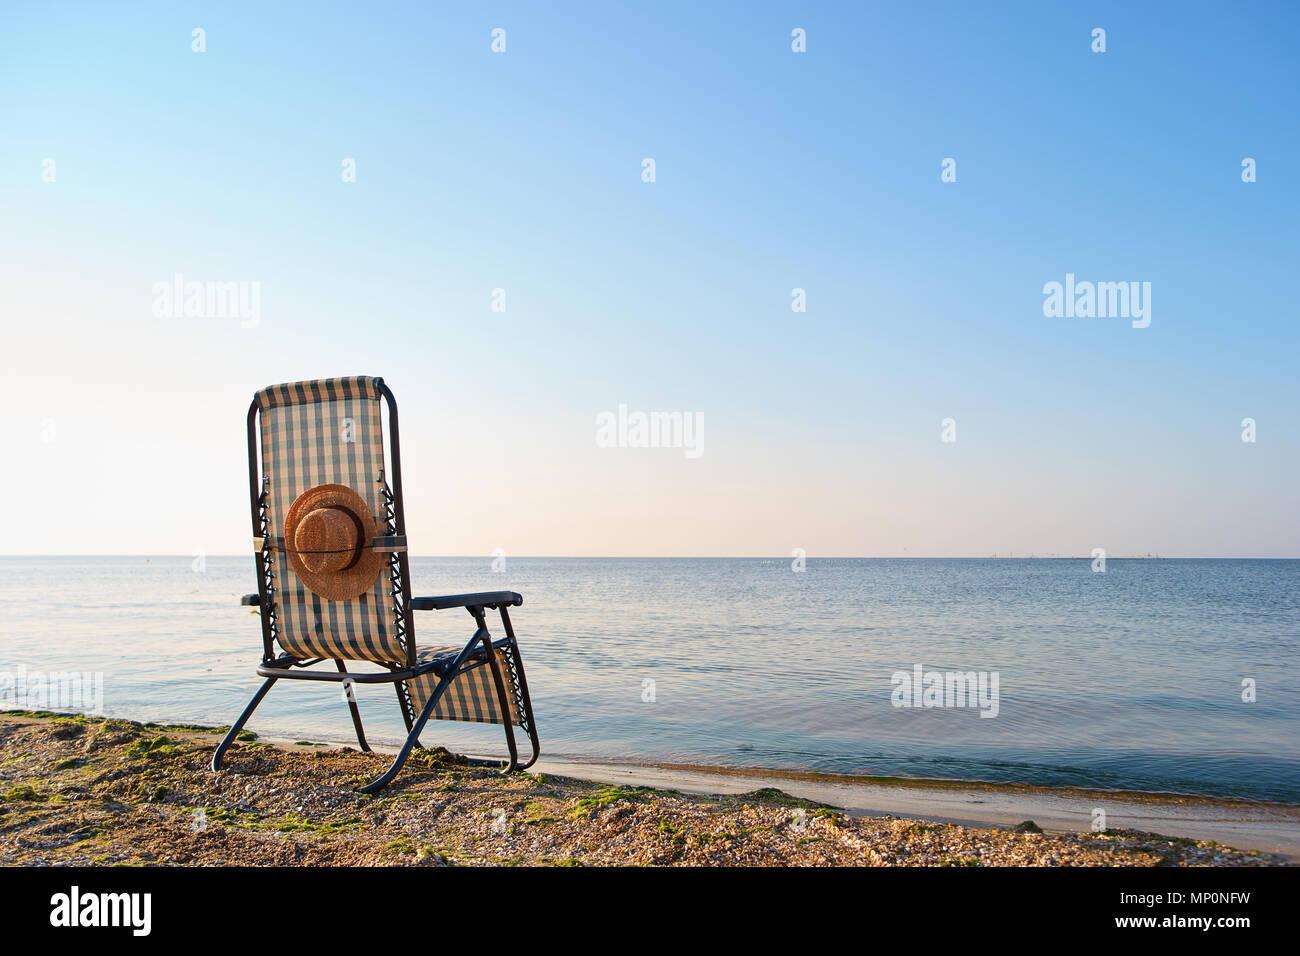 Back view deskchair in morning sea landscape. - Stock Image